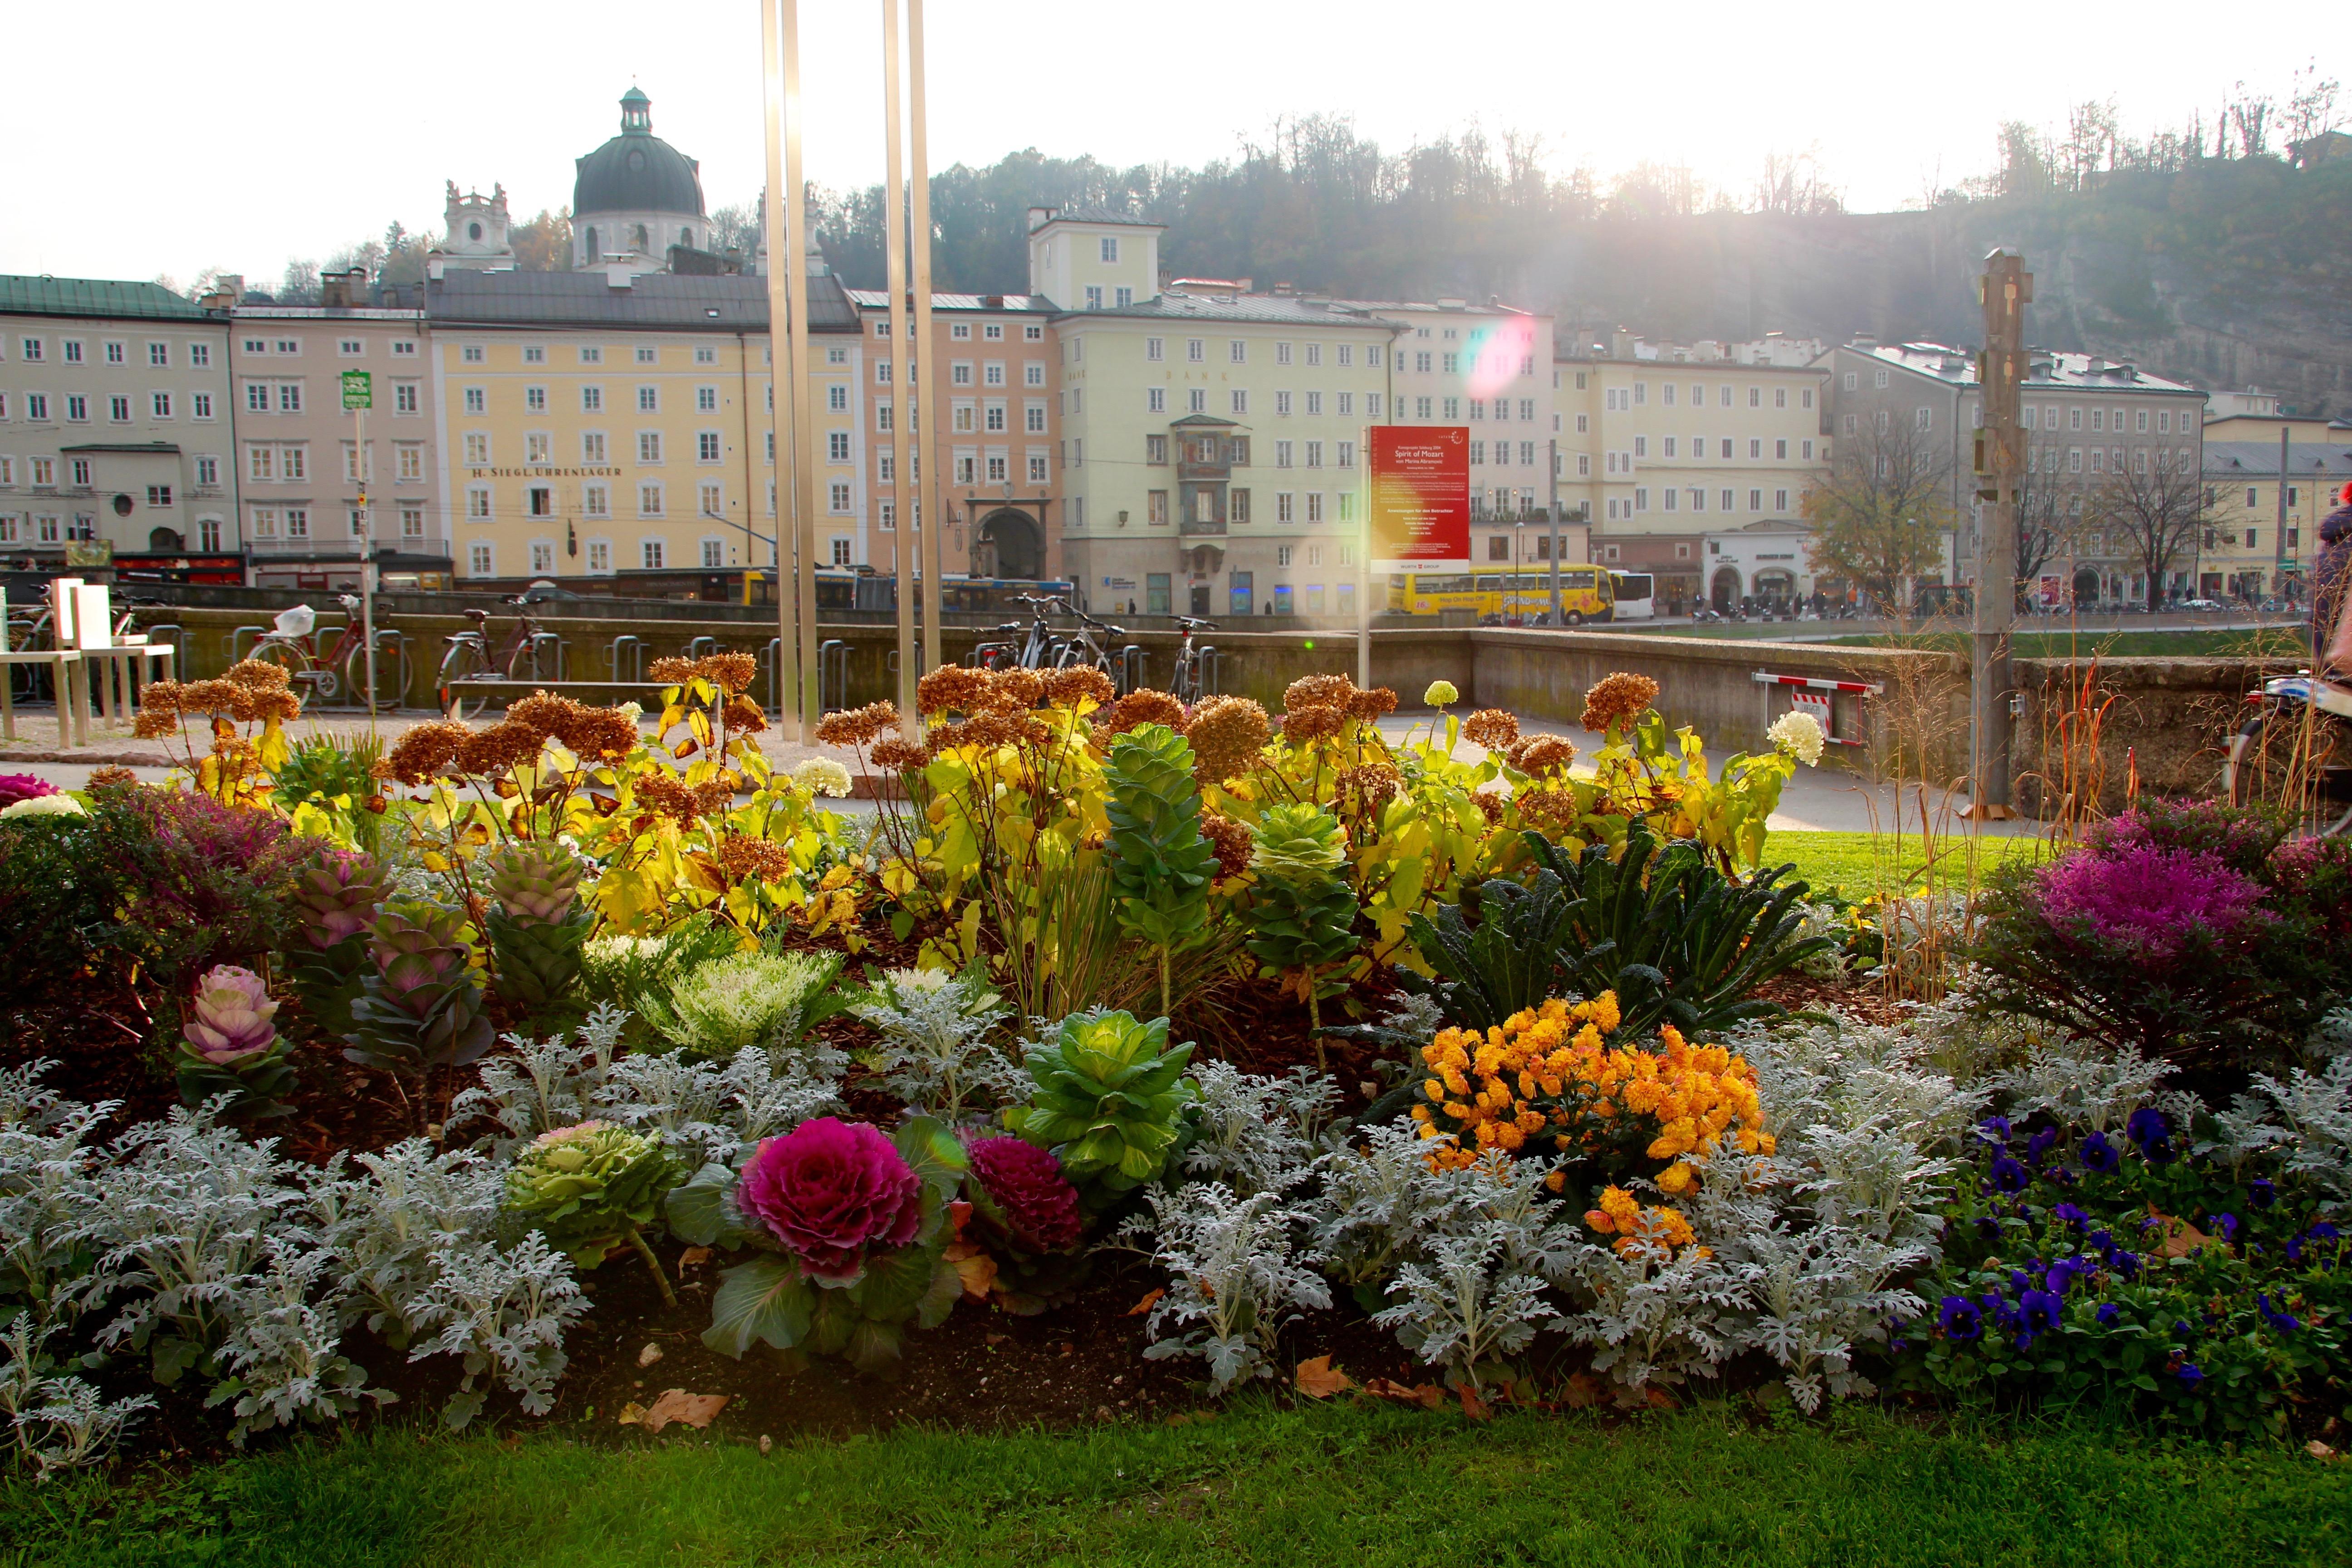 Gardens outside Sacher Hotel. Salzburg, Austria